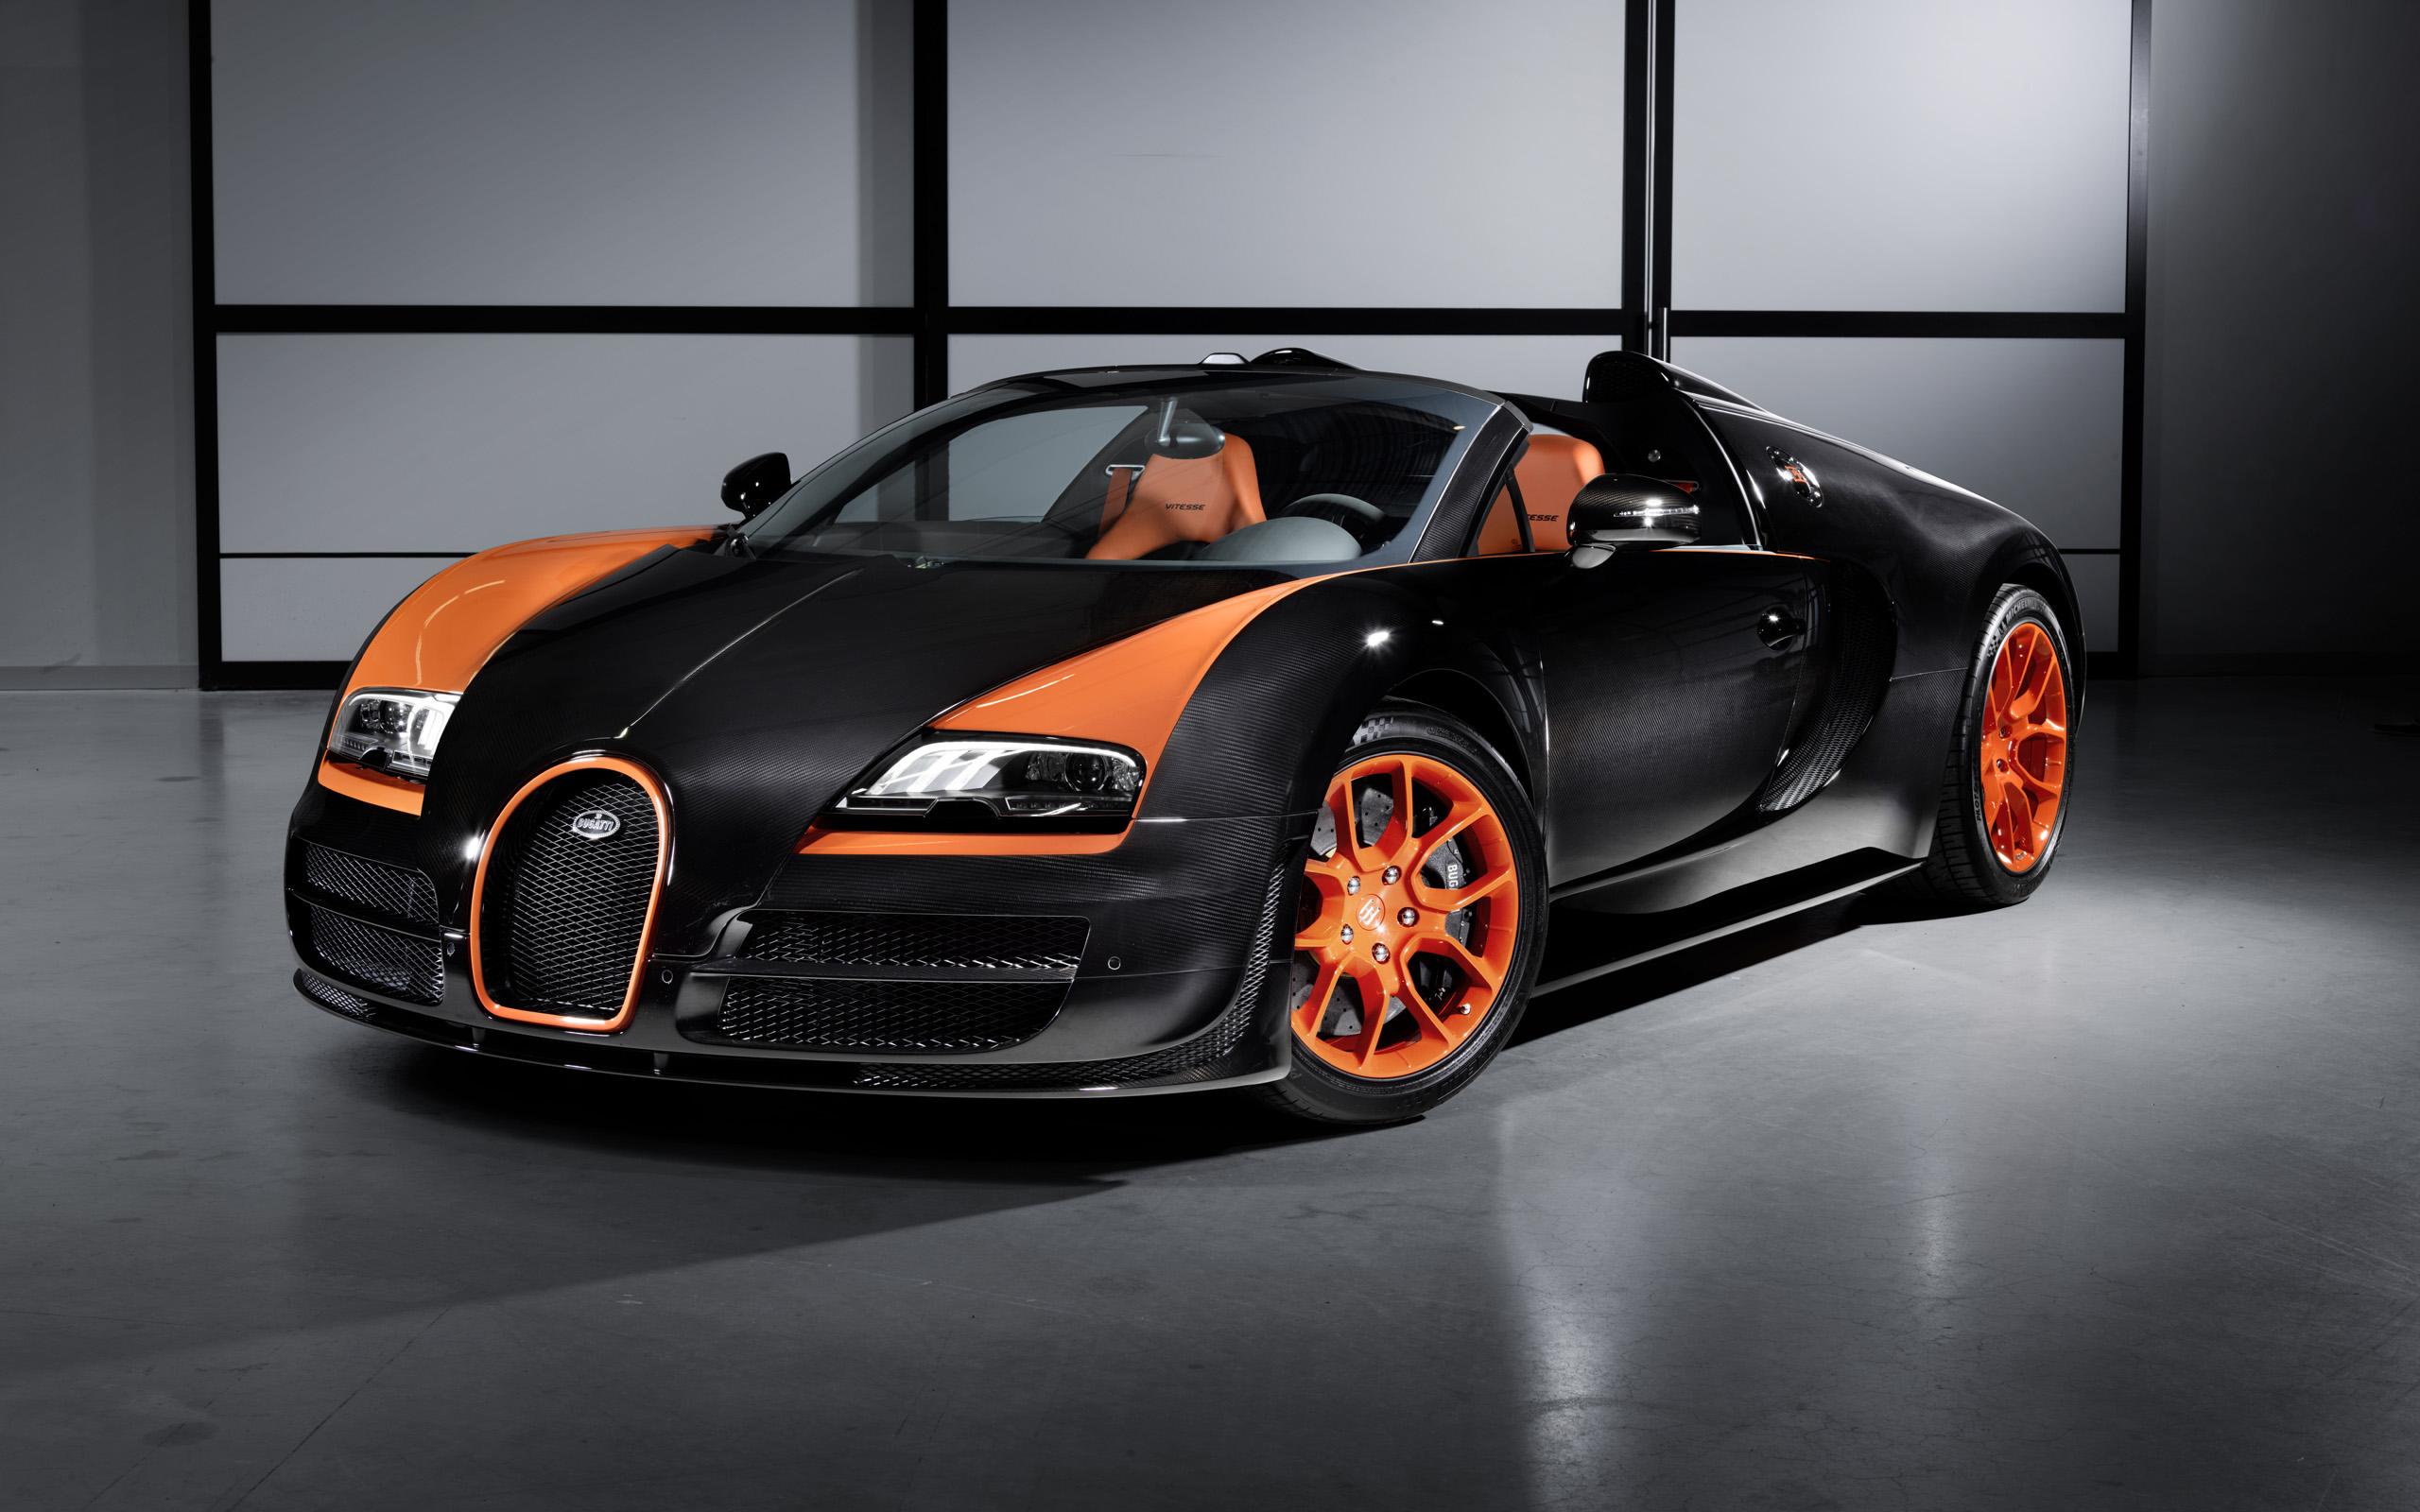 2013 Bugatti Veyron 16 4 Grand Sport Vitesse World Speed Record Wallpaper Hd Car Wallpapers Id 3617